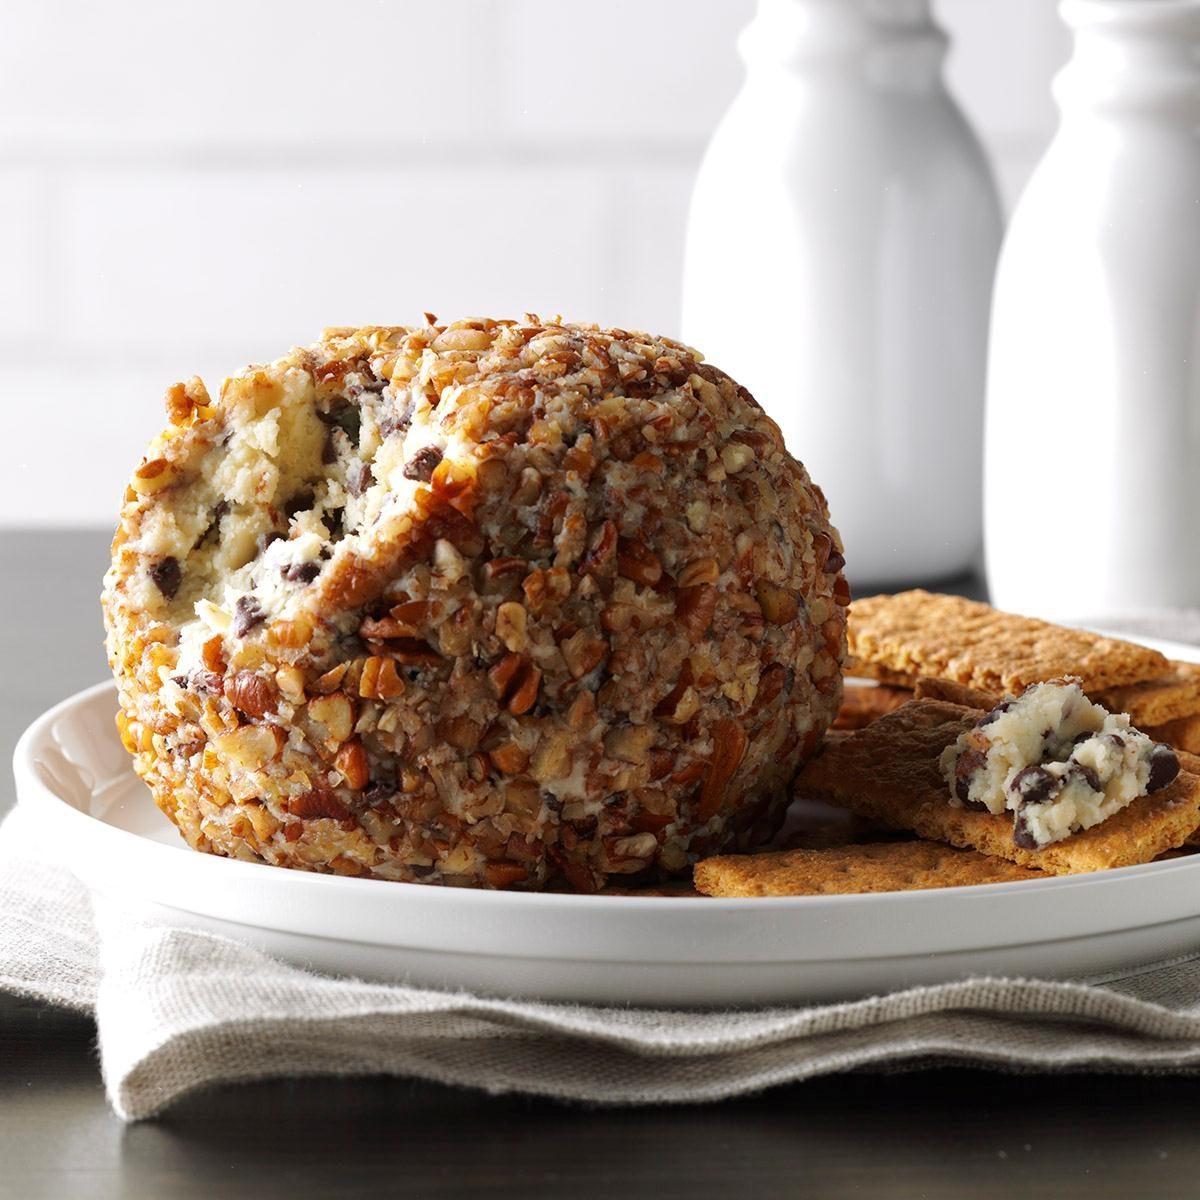 Chocolate Chip Cheese Ball Recipe | Taste of Home